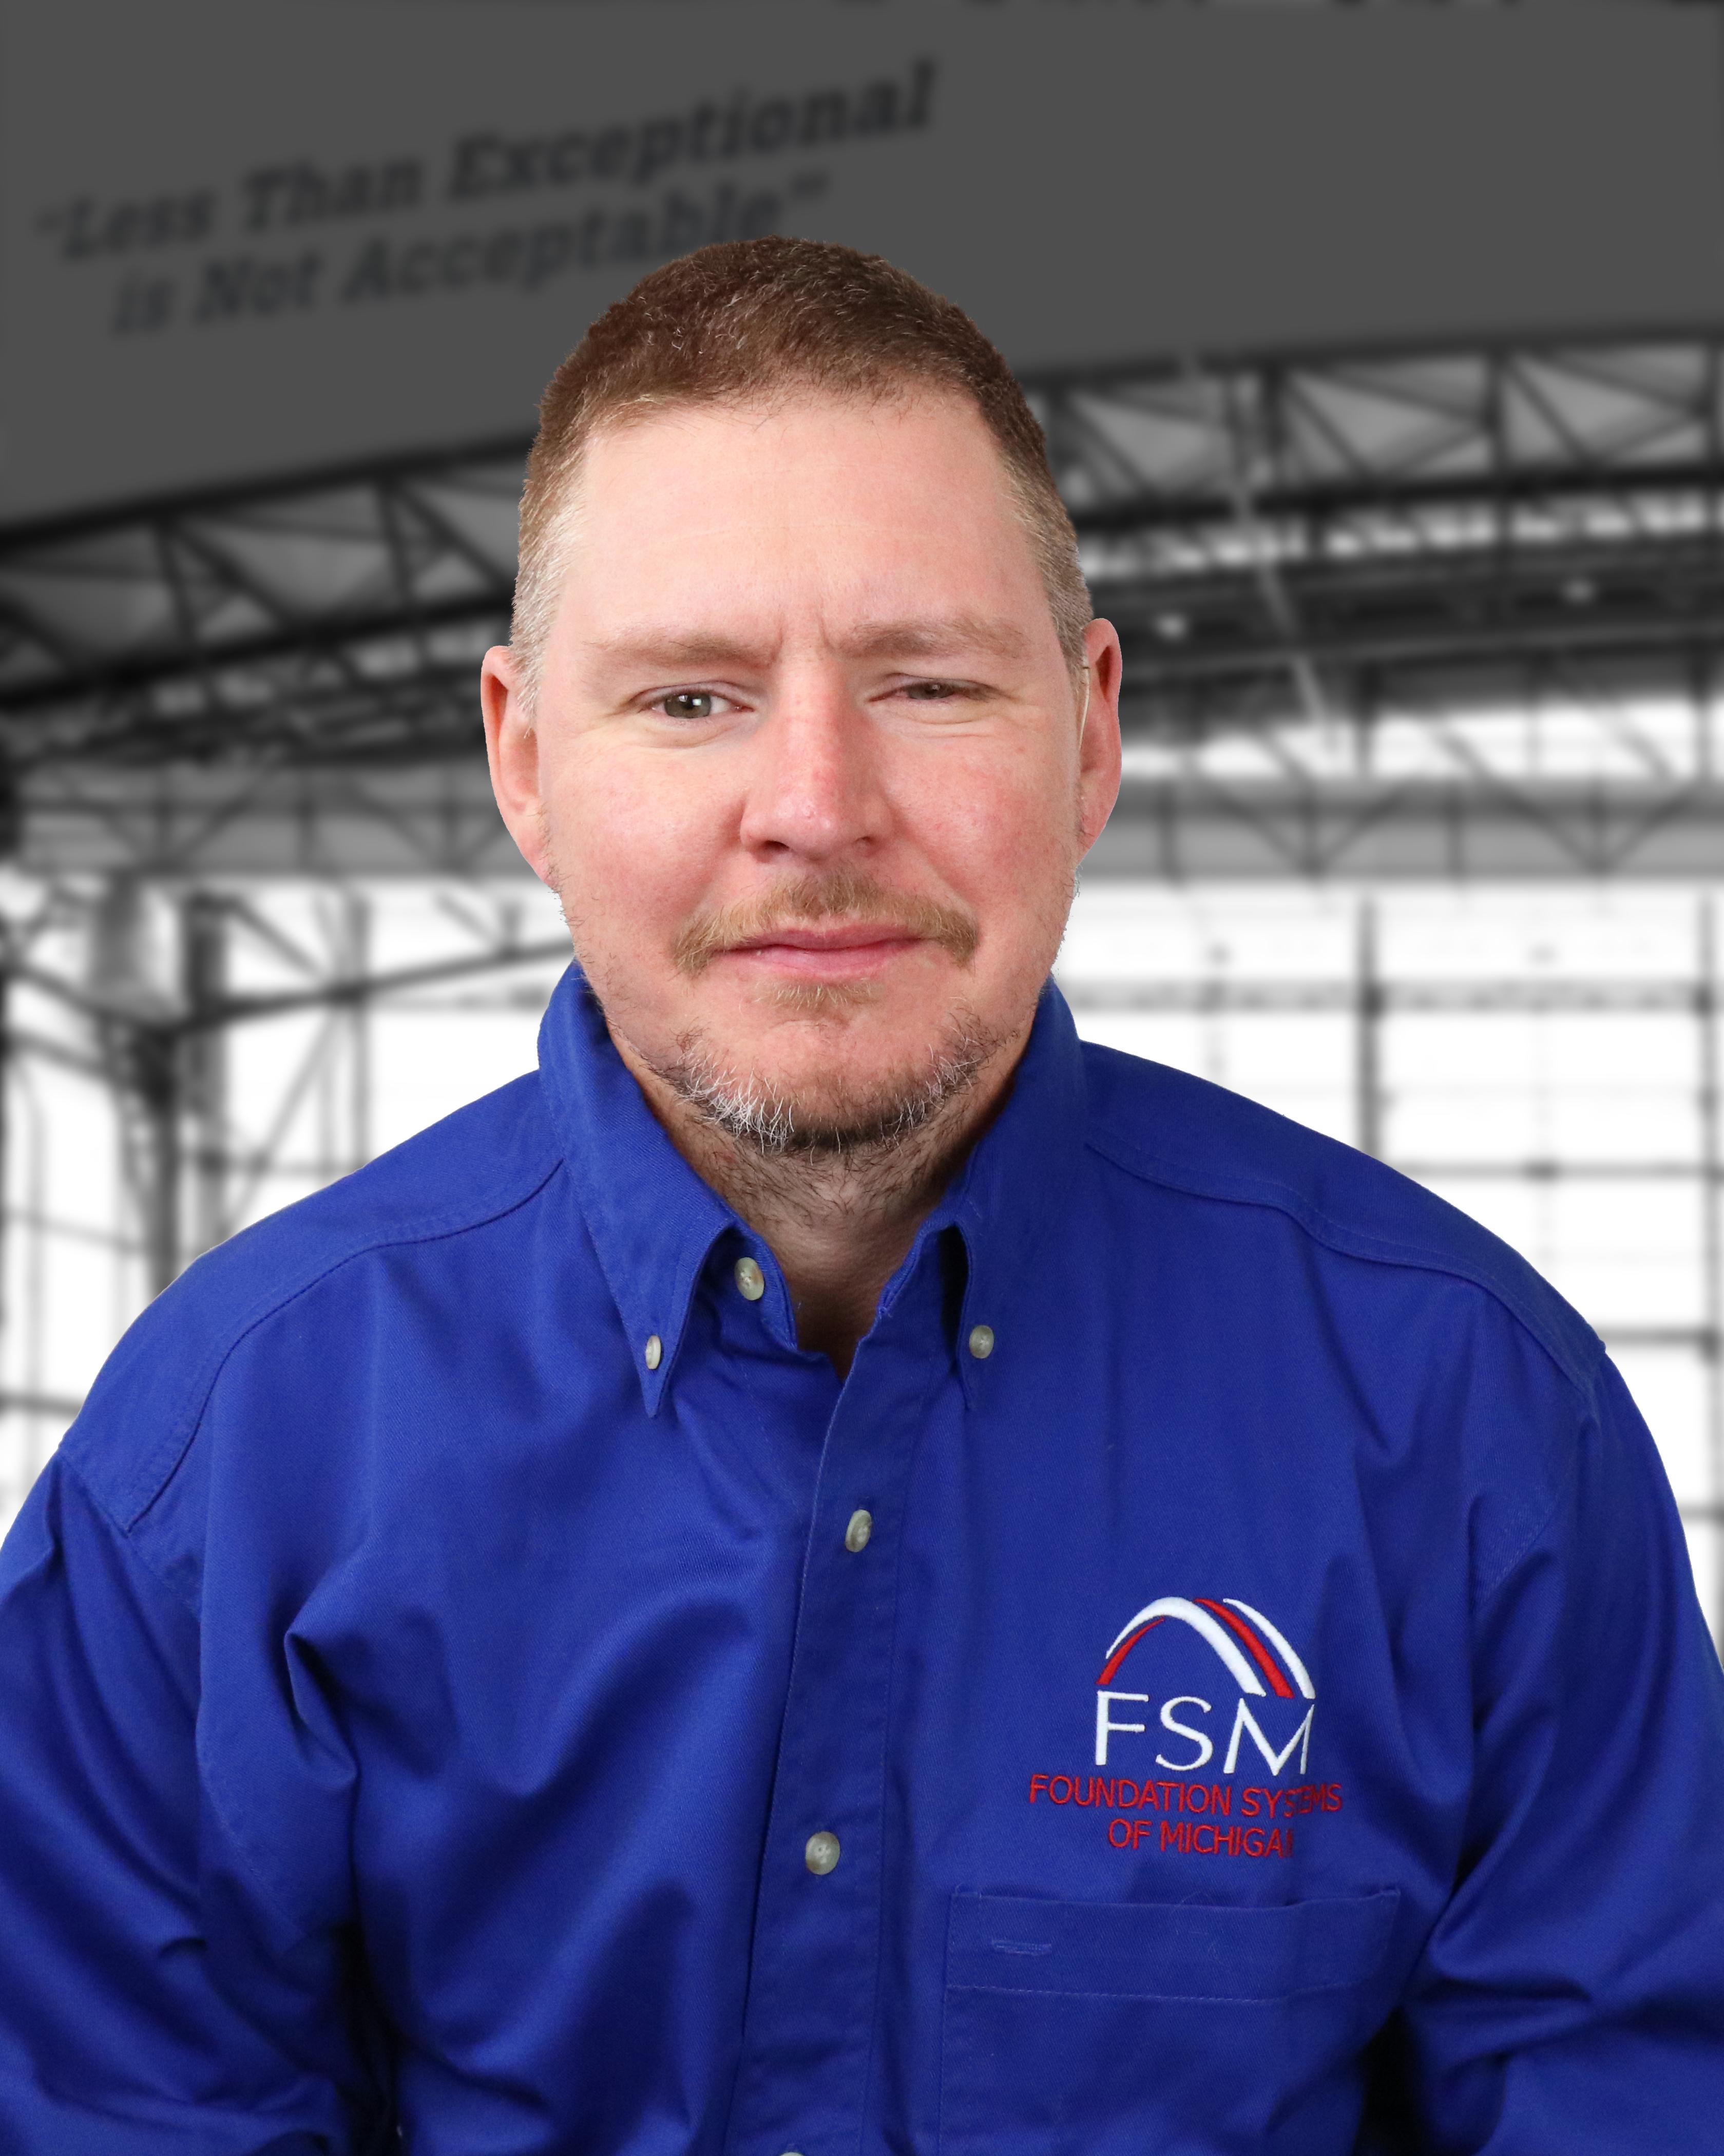 FSM Phil Puzon Foreman